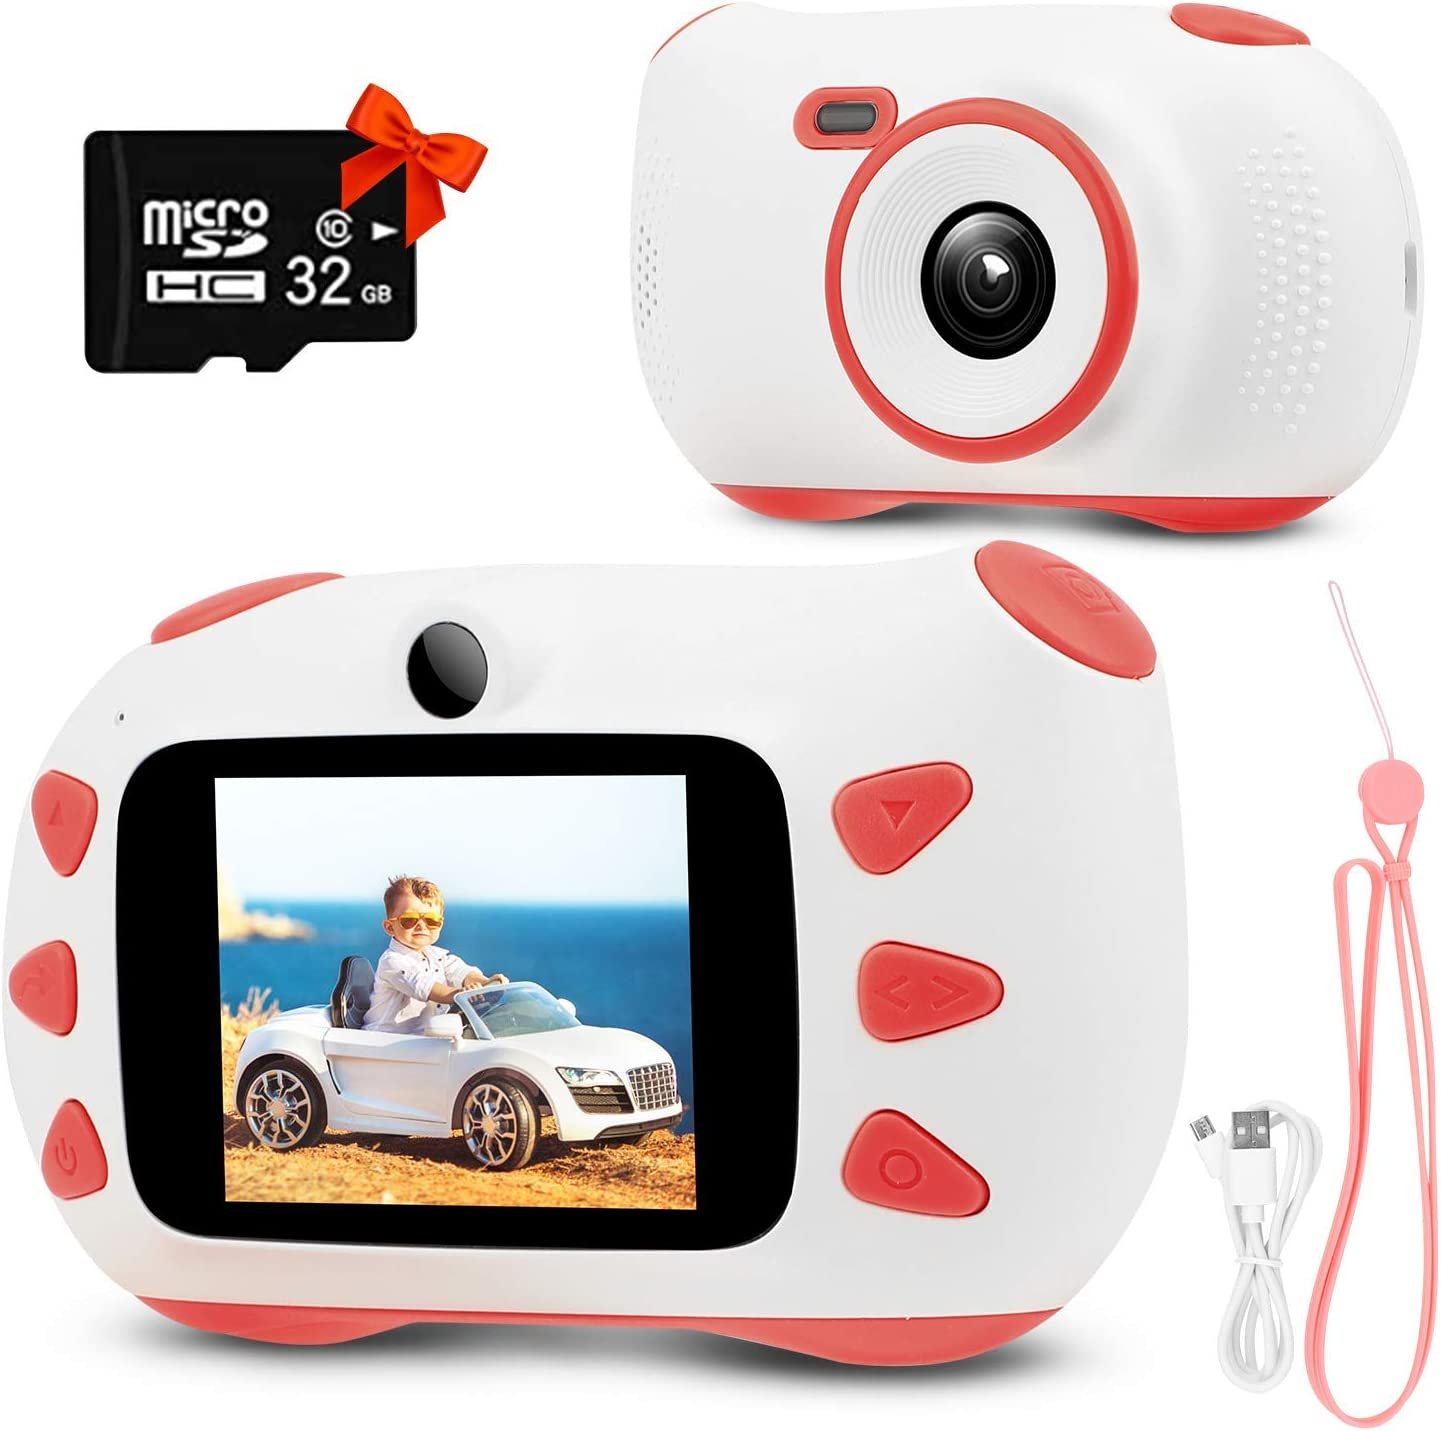 Rumia Digital-Kinderkamera mit Display